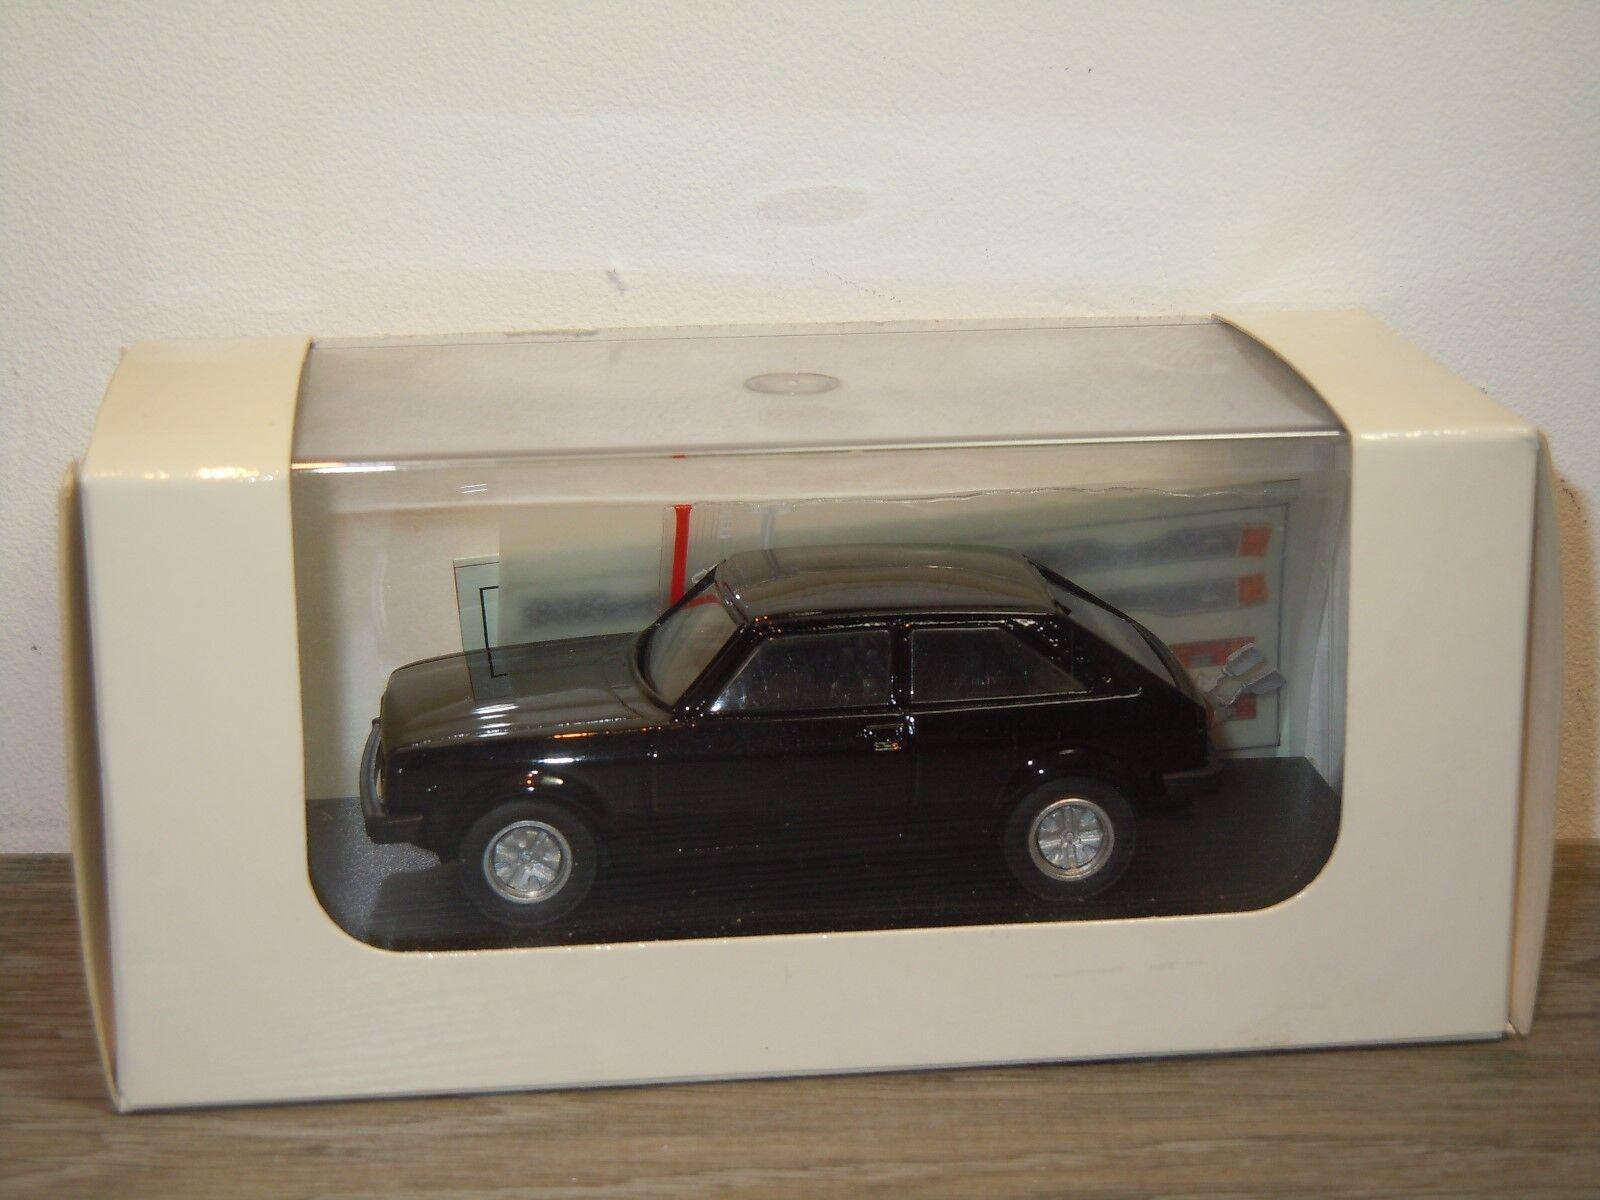 Talbot Lotus Sunbeam Civile - Prestige 1 43 in Box 35238